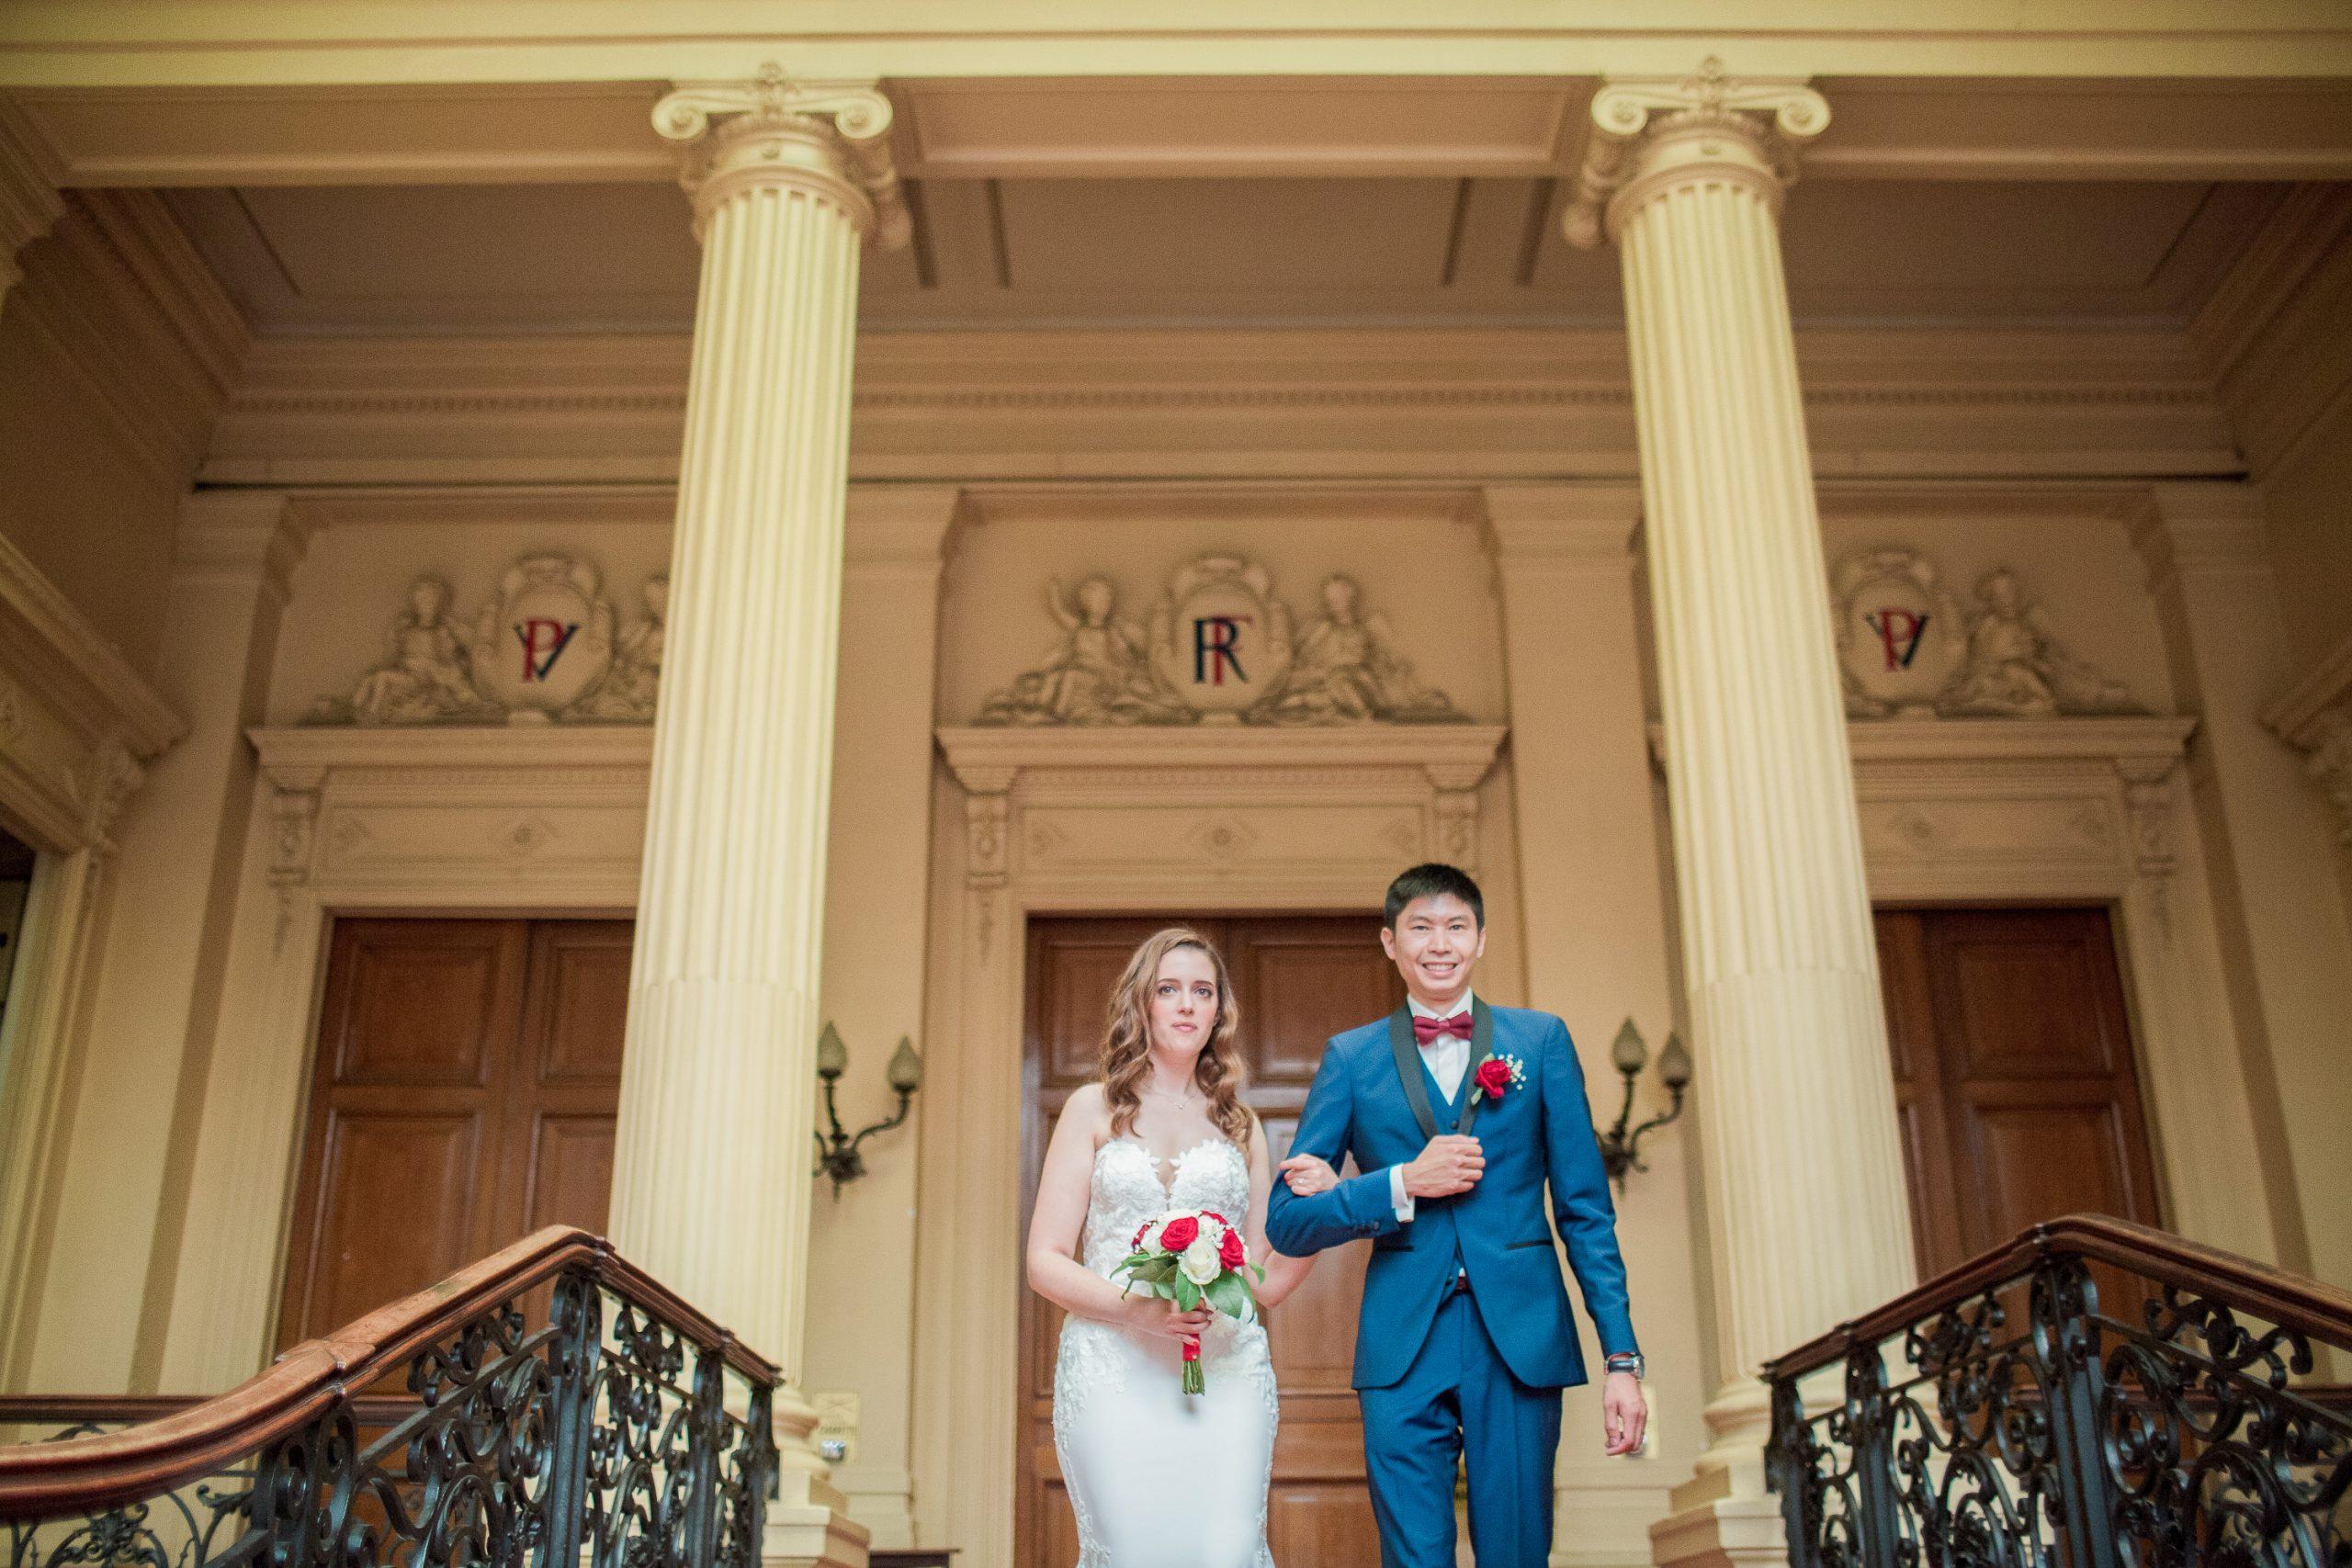 photographe-mariage-mairie-du-18eme-sortie-cérémonie